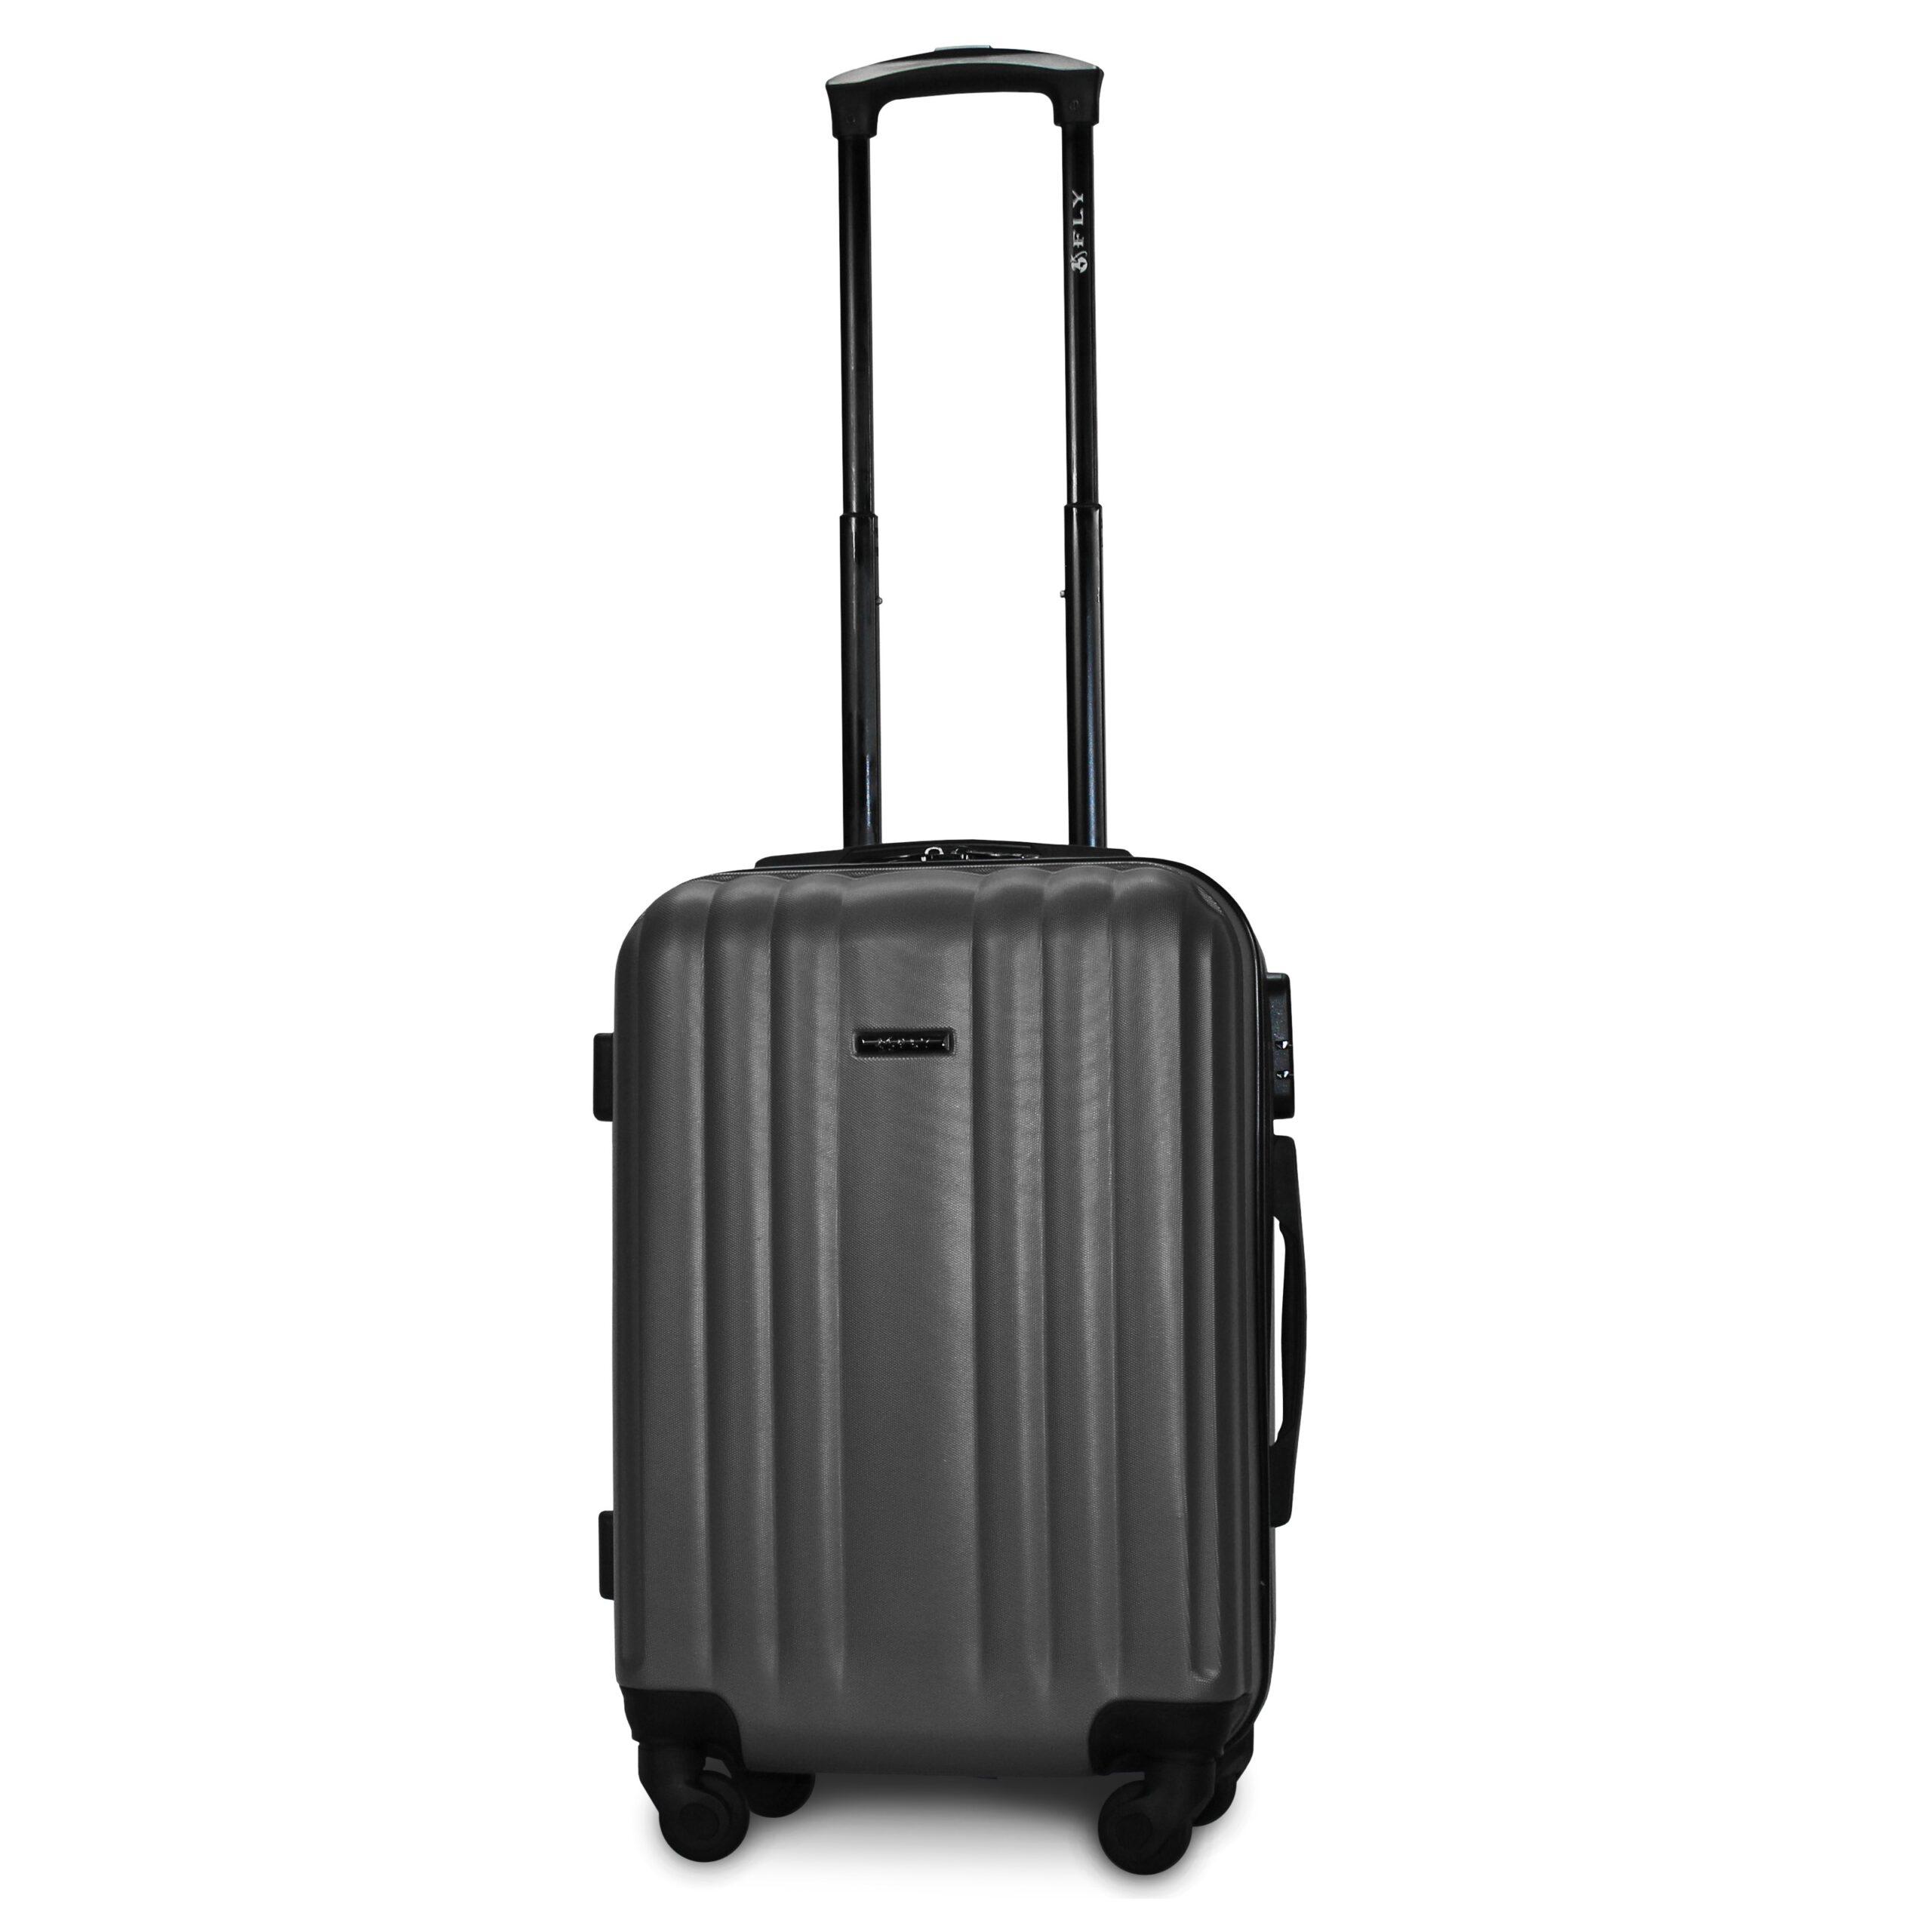 Маленький чемодан (S) Fly 614 | пластиковый | темно-серый | 55x40x20 см | 35 л | 2,6 кг